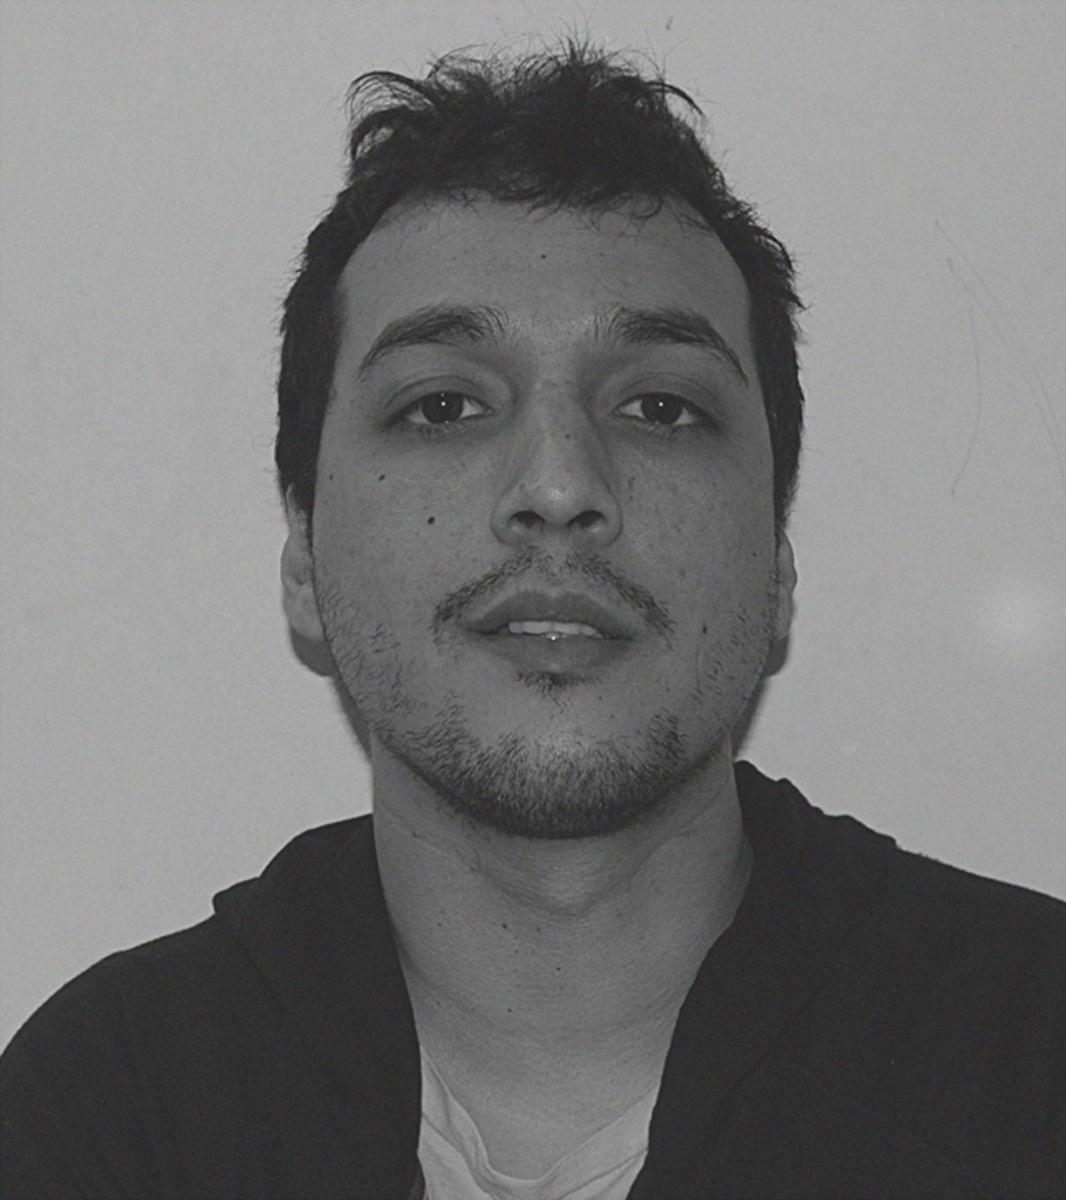 PAS Nantes 2012 - Tomas Espinoza (Argentine) - Réalisateur - HARPOON